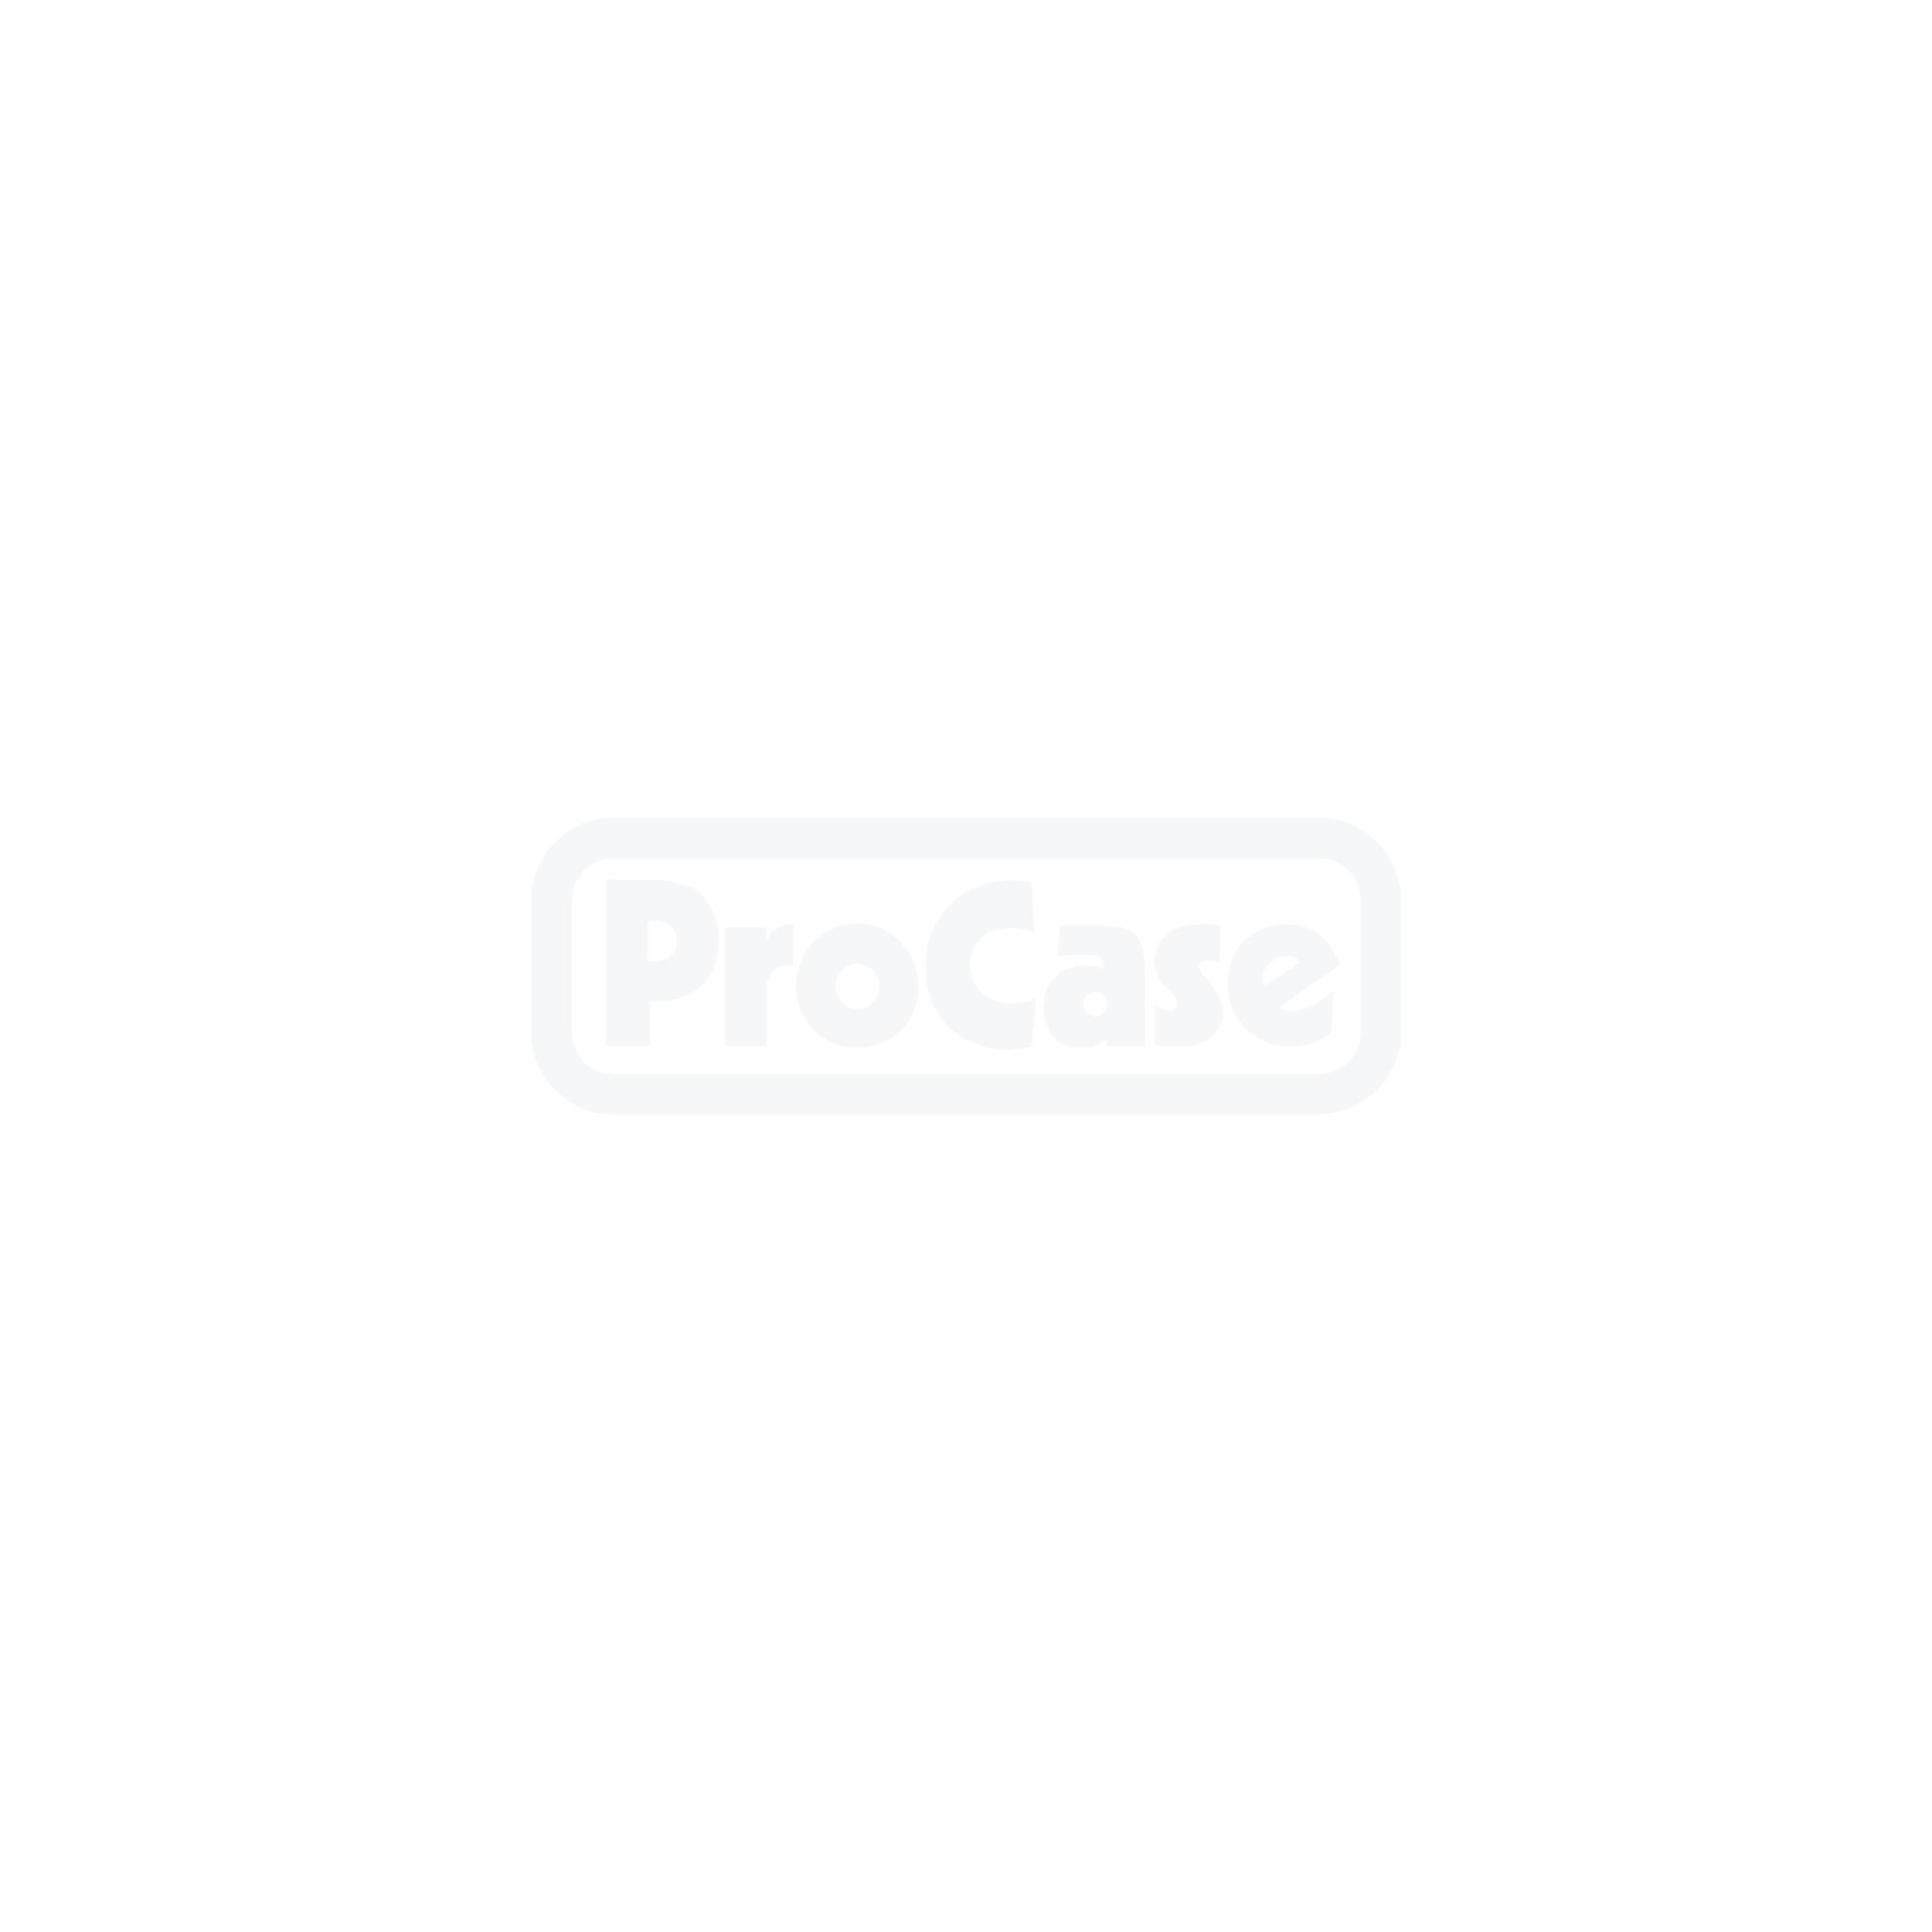 SKB 3i Koffer 0705-3B mit Rasterschaumstoff